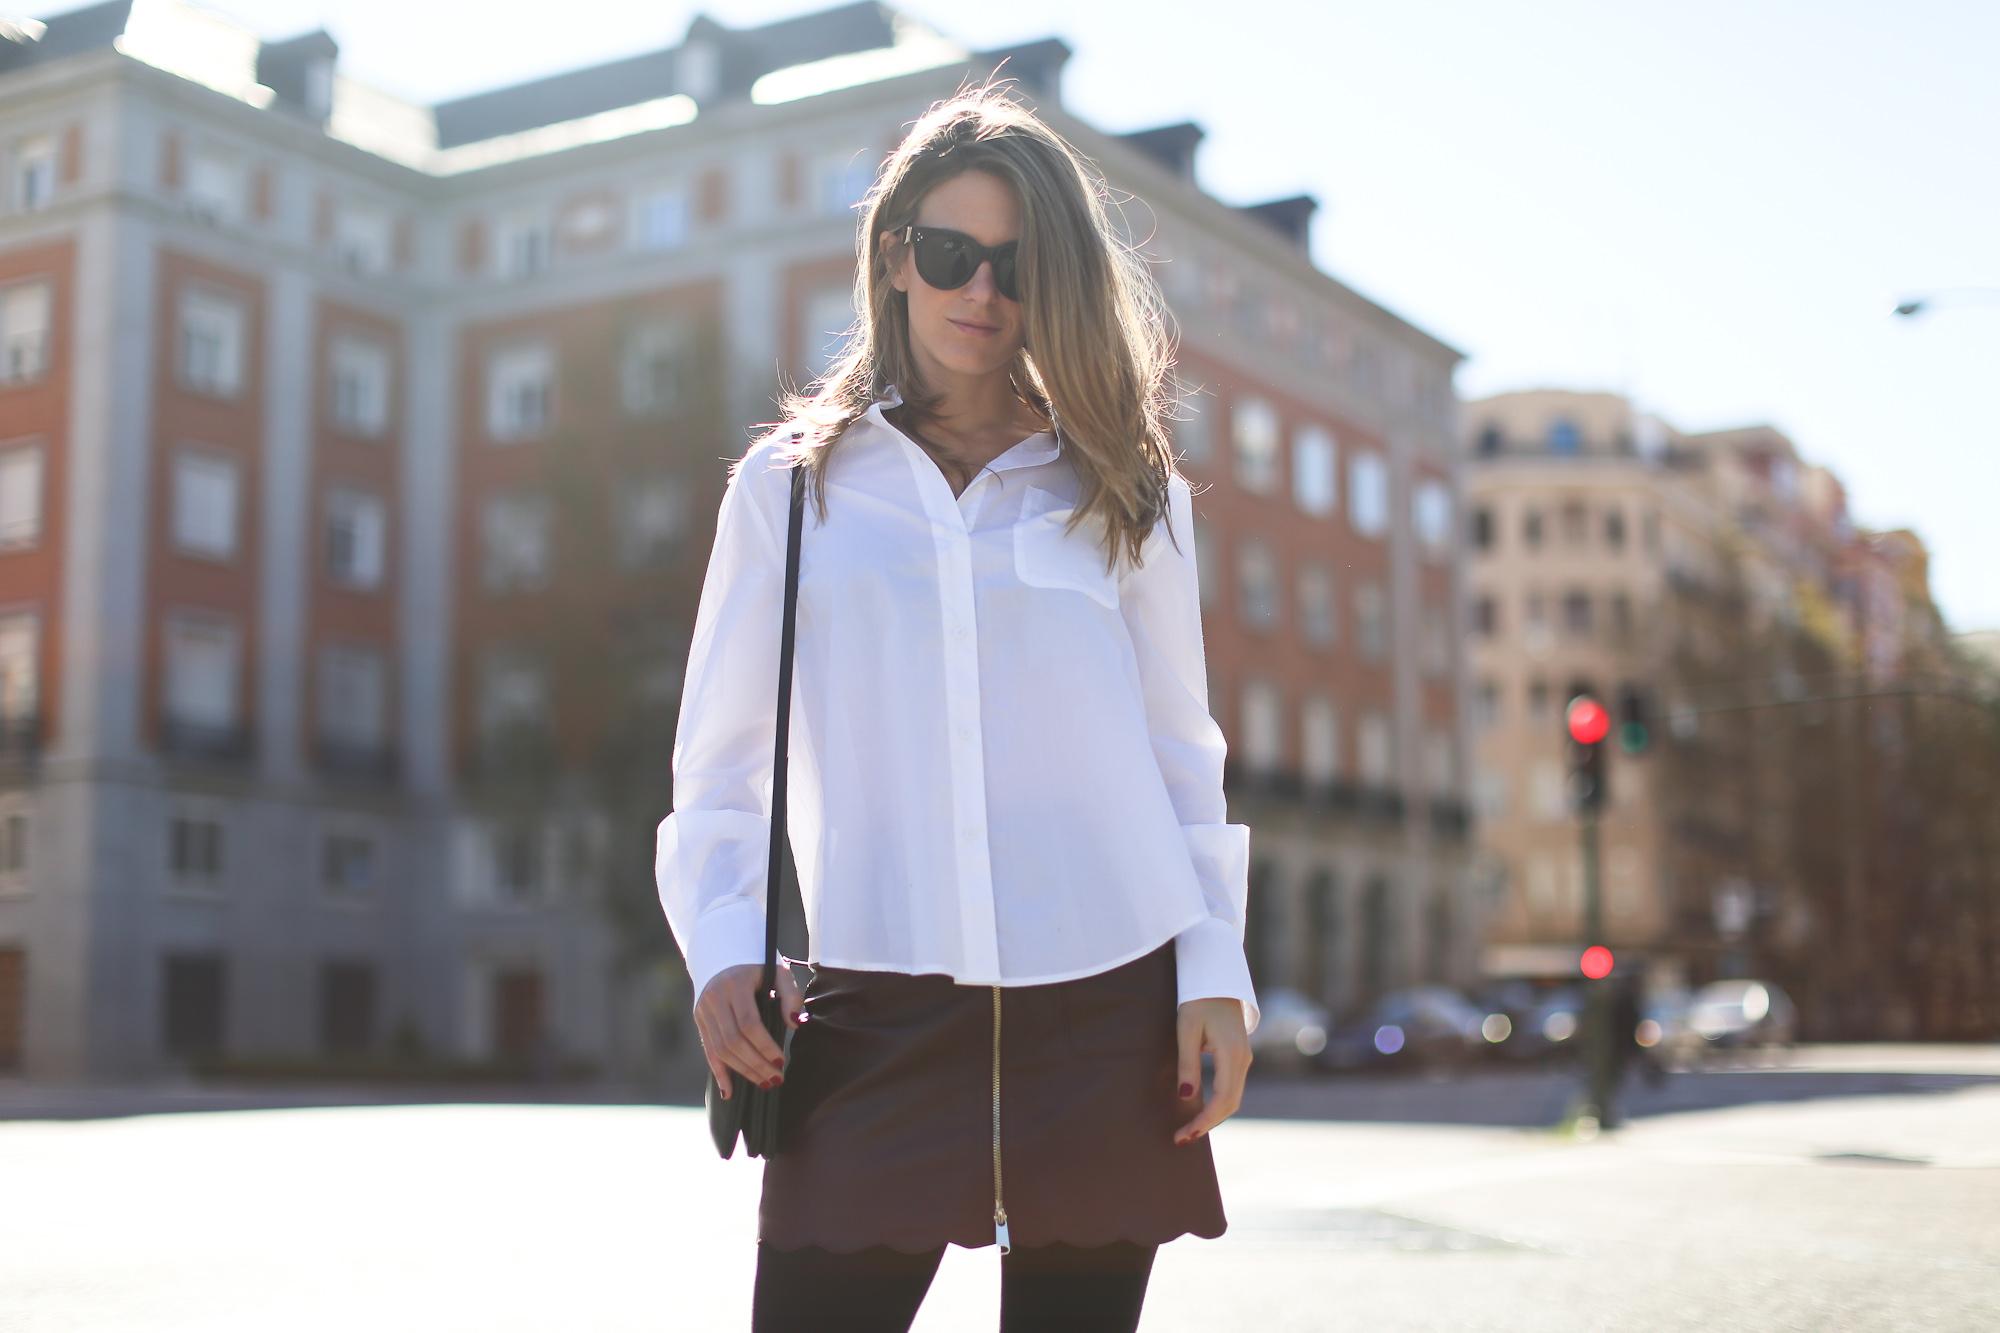 Clochet_streetstyle_maxandCo_leatherminiskirt_h&mtrend_blouse_sandroparis-brogues-8